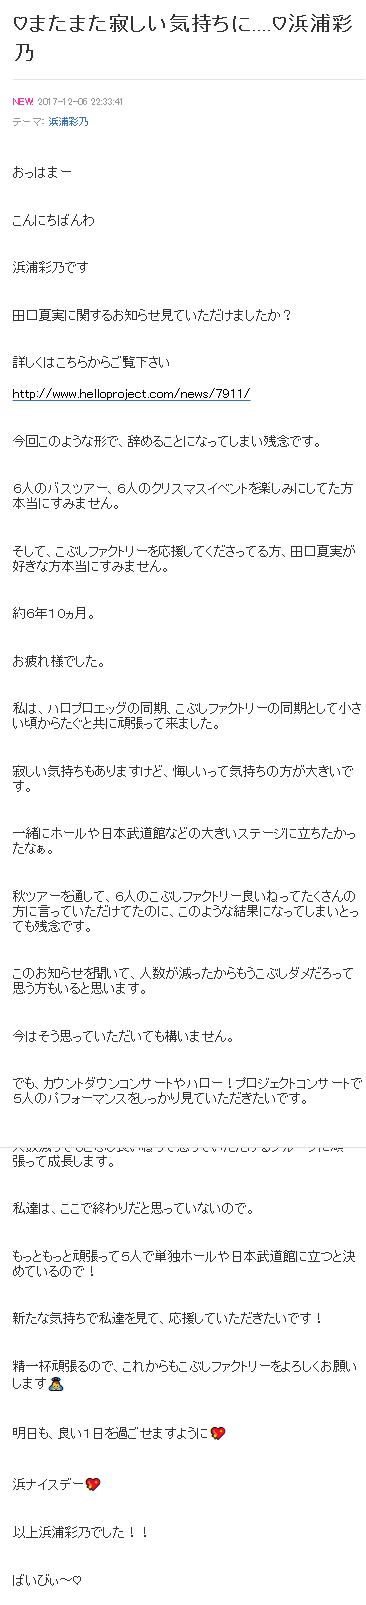 Screenshot-2017-12-7 こぶしファクトリー『♡またまた寂しい気持ちに ♡浜浦彩乃』.png